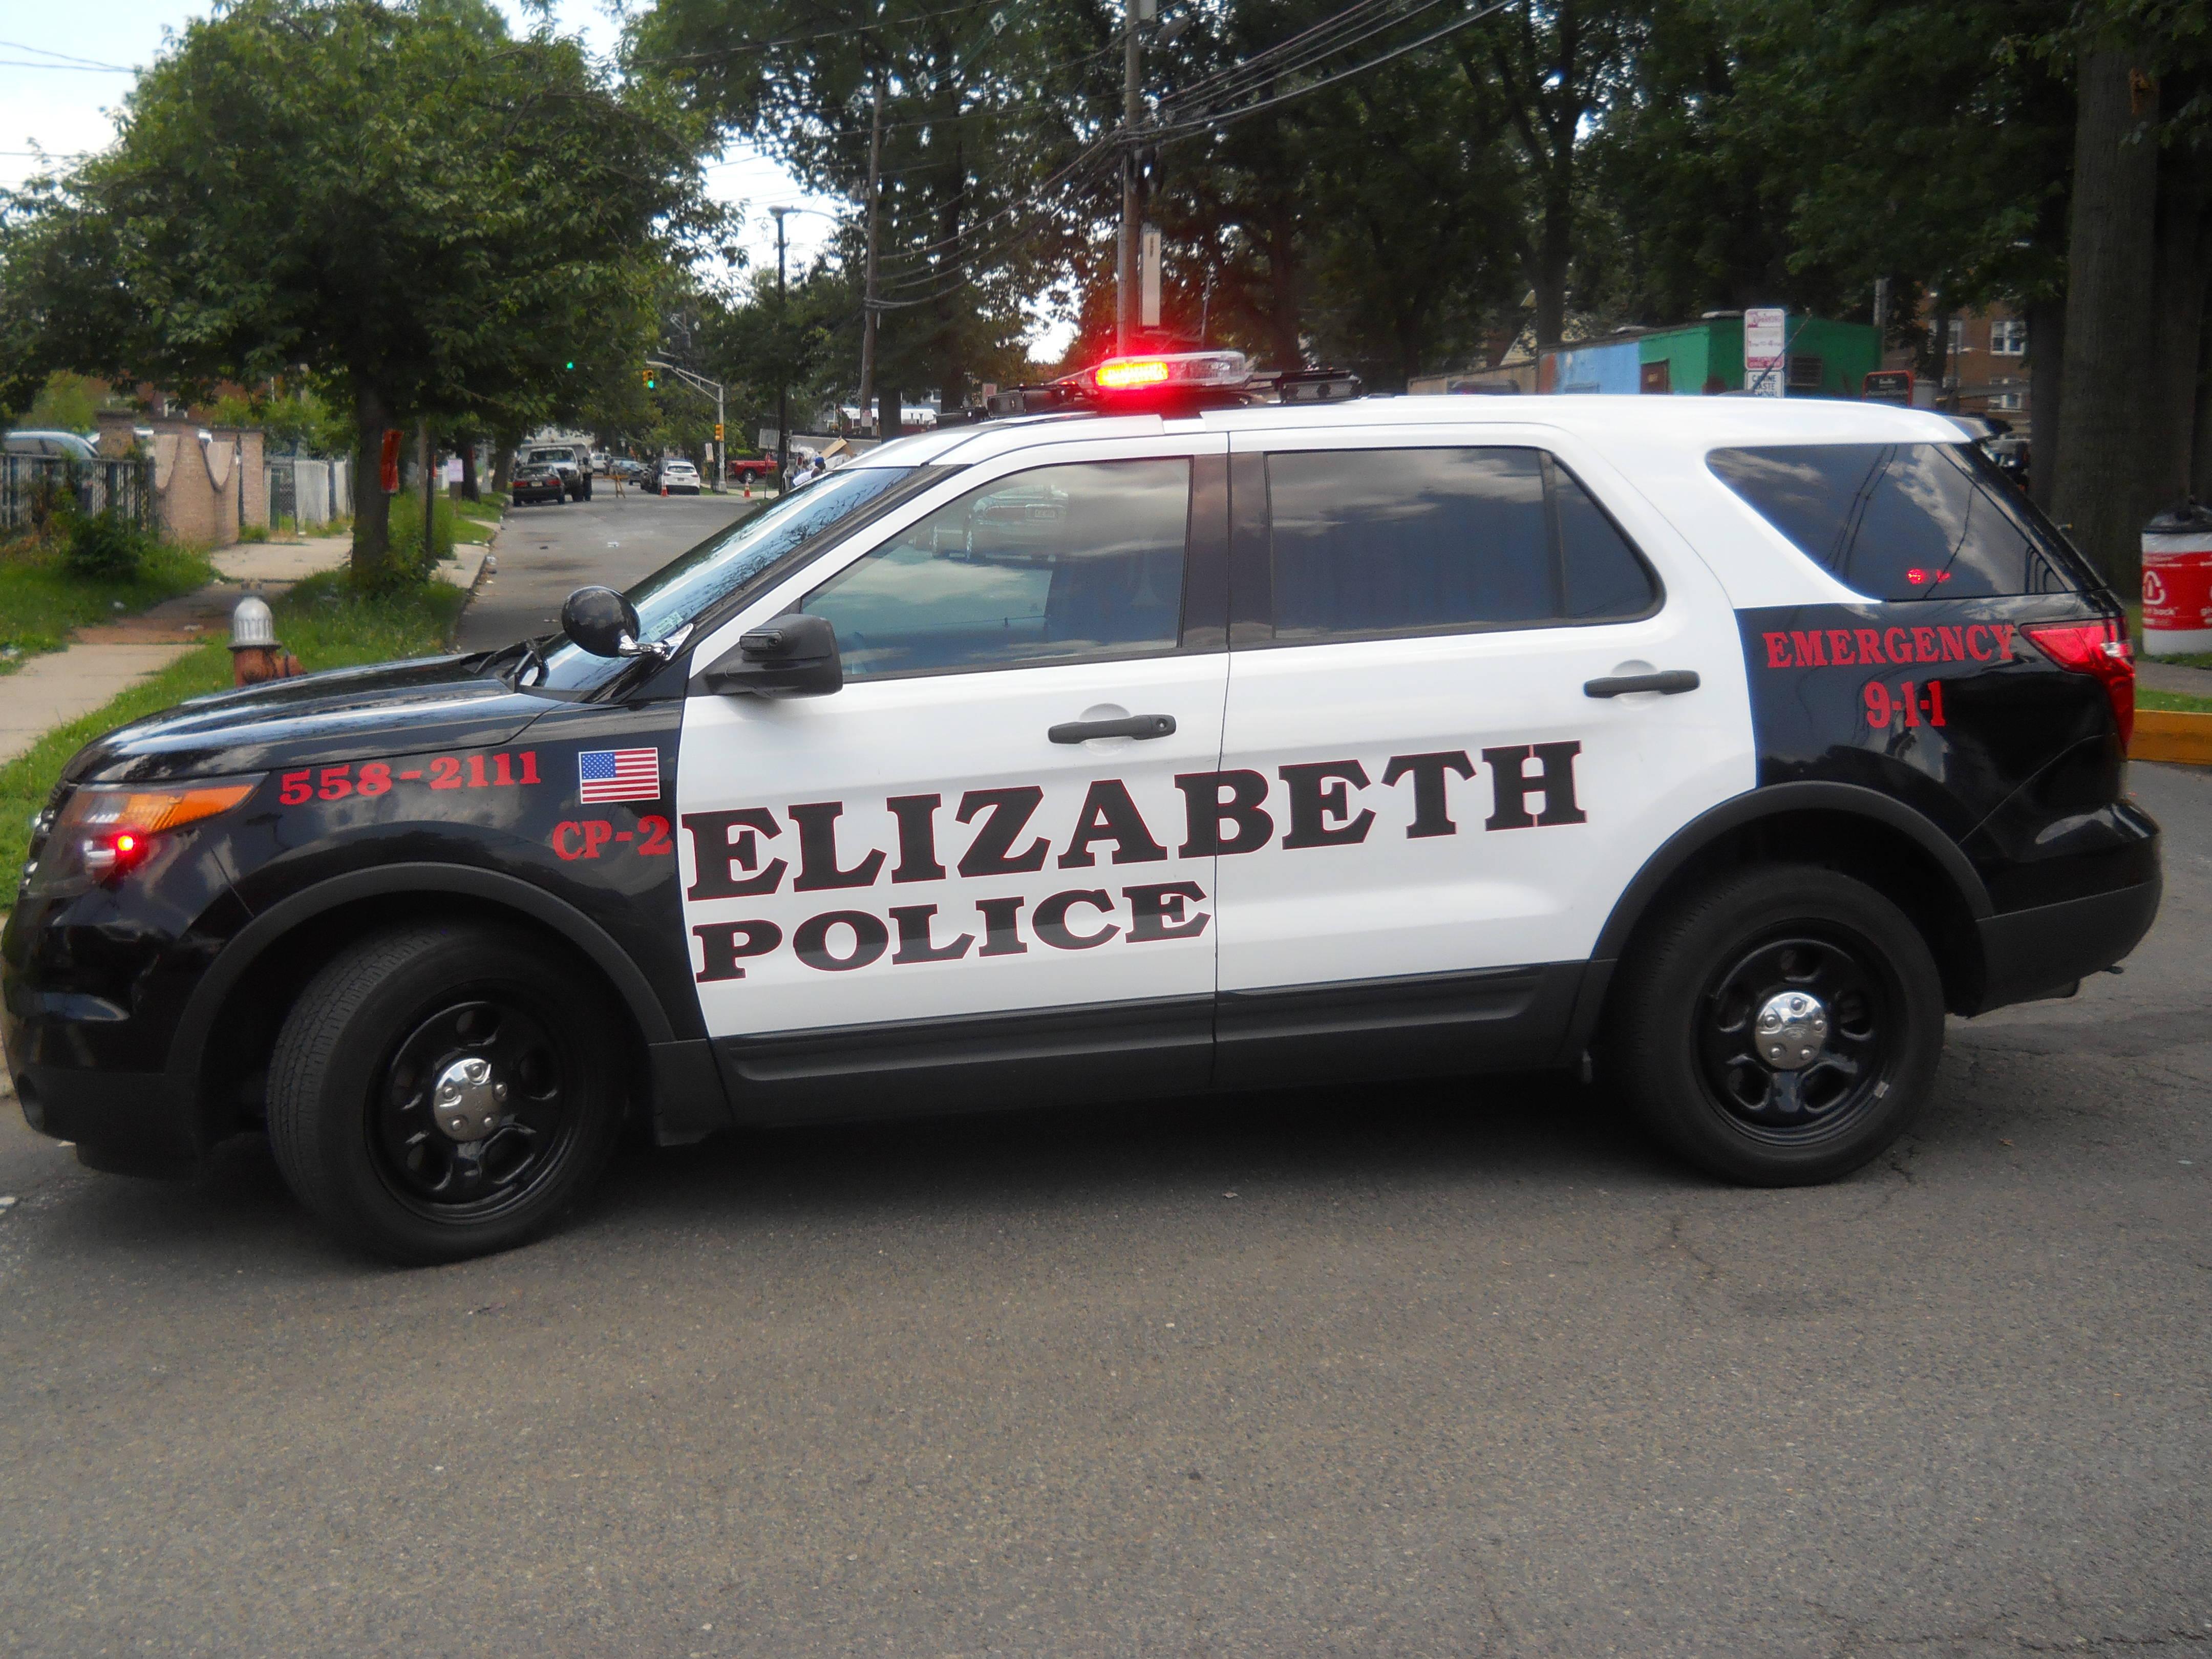 51933d3a3d70da167853_Police_Car.jpg